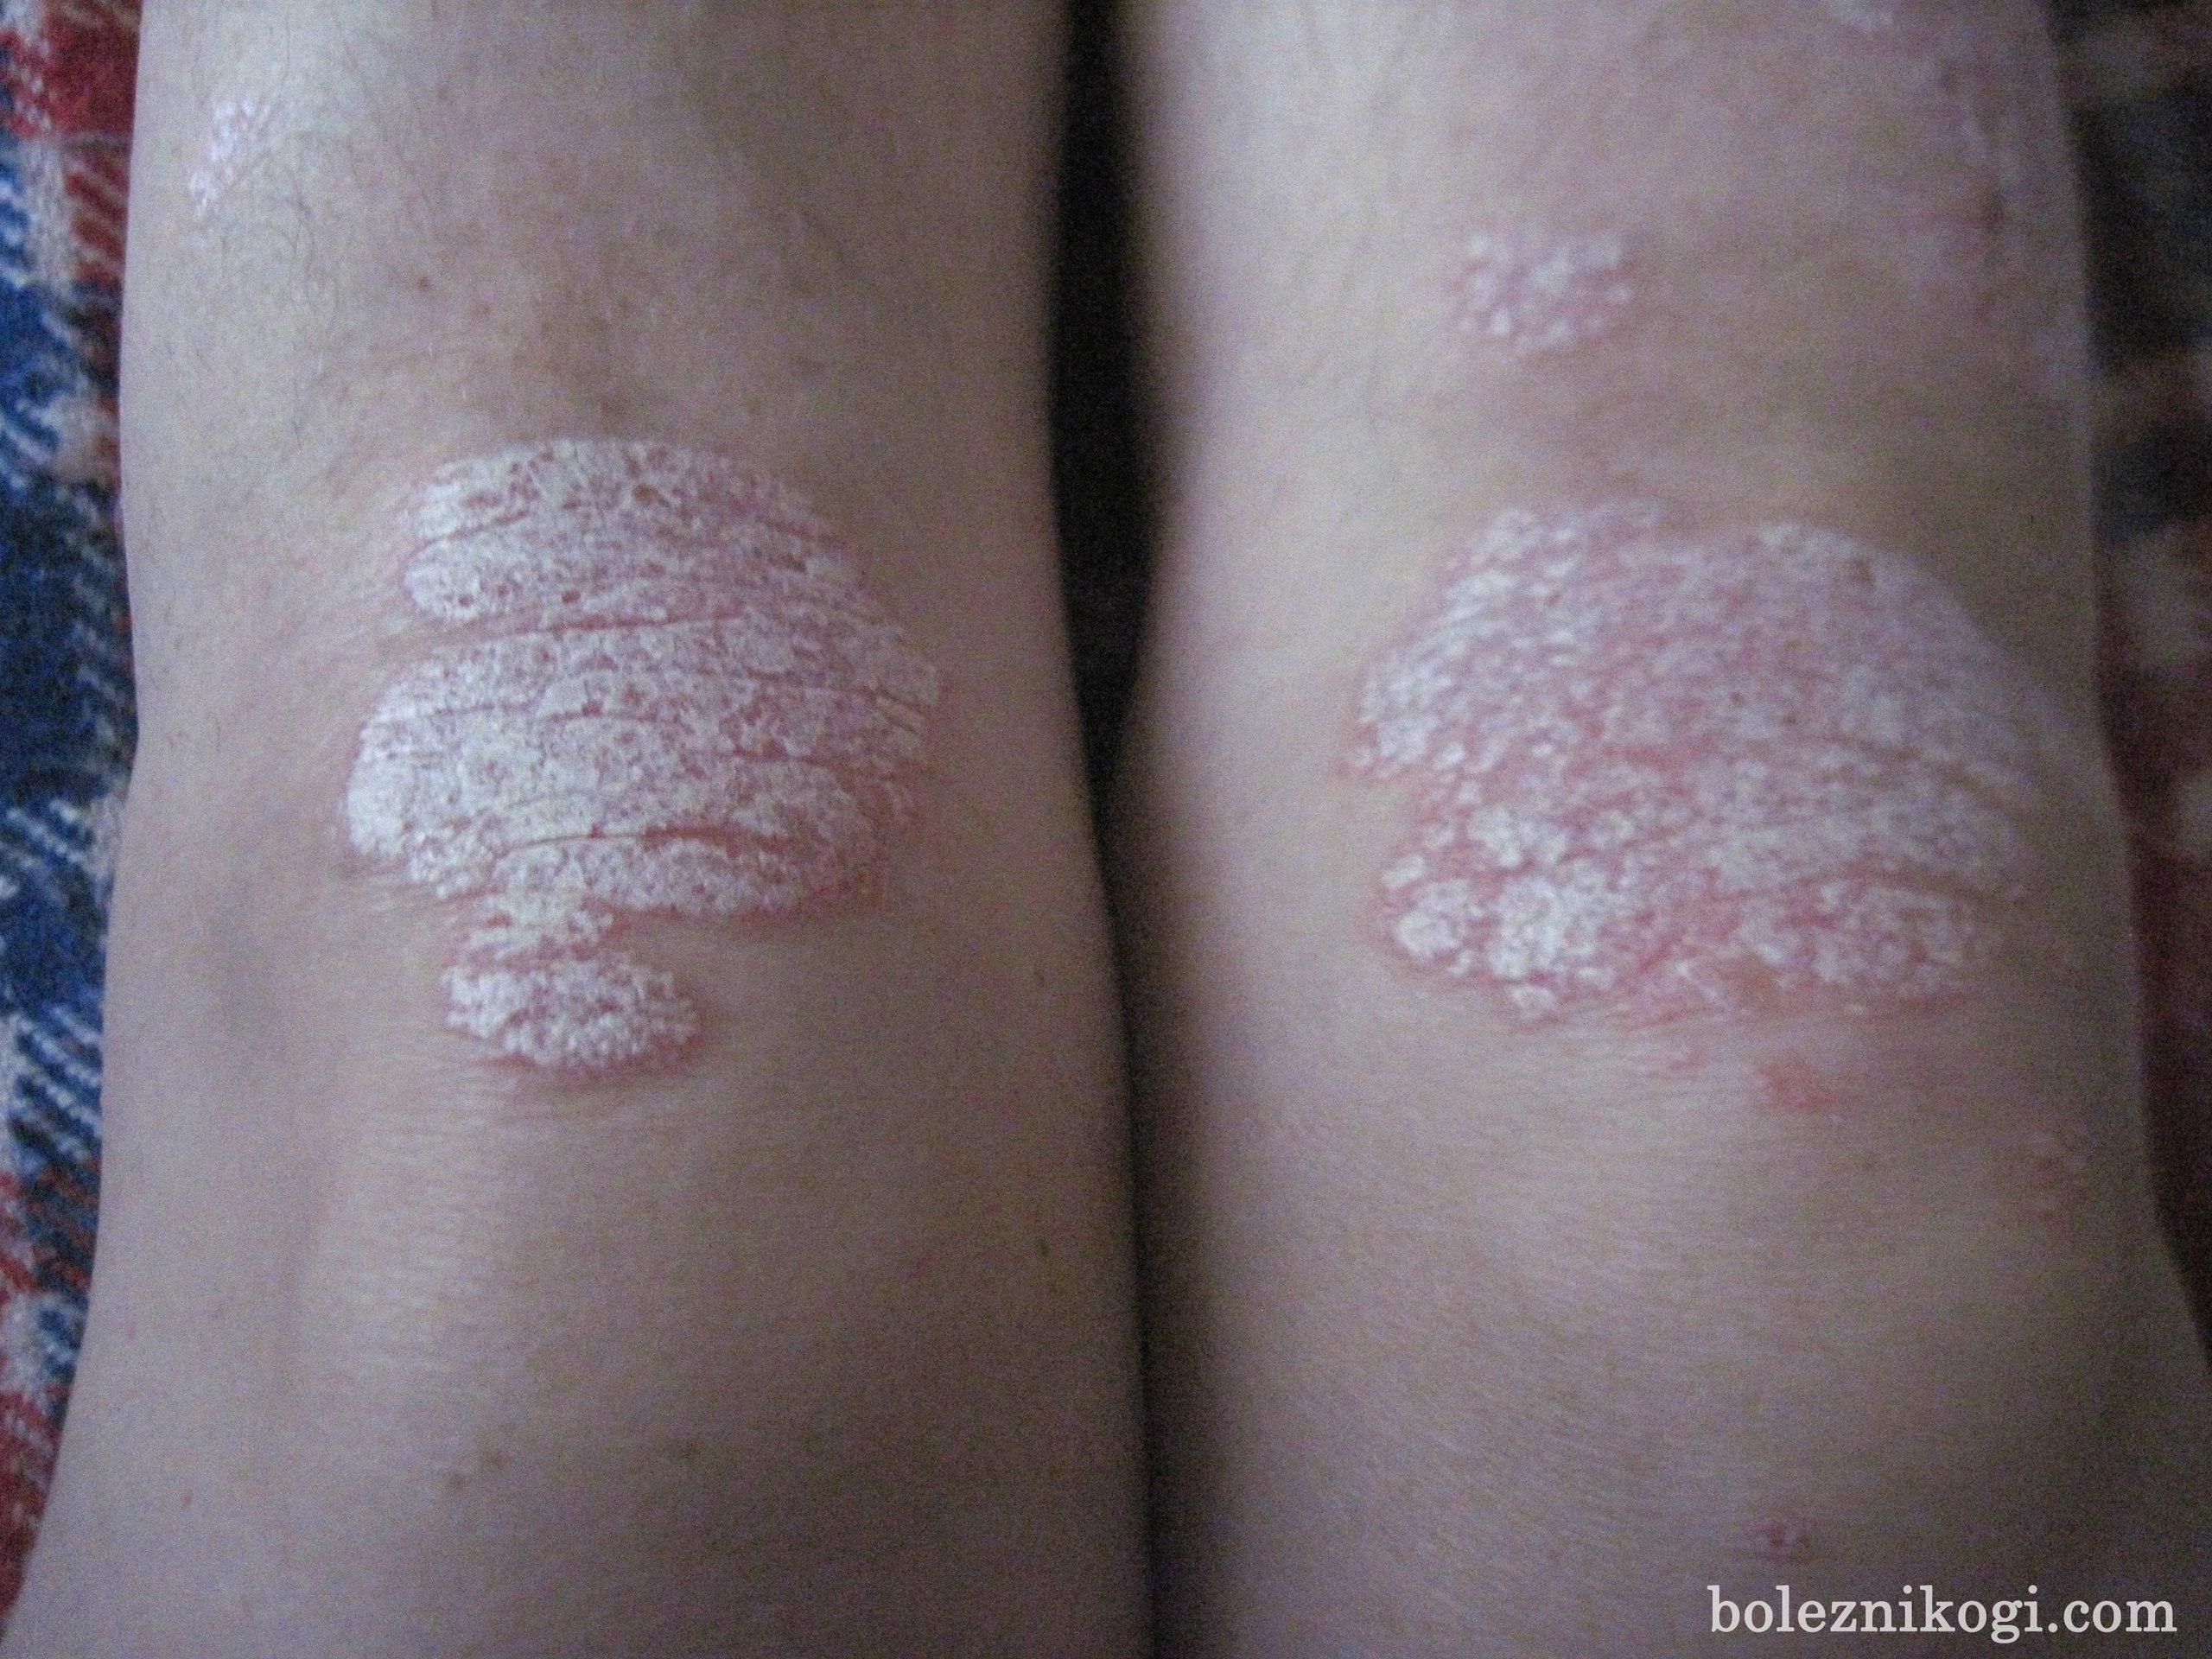 фото псориаза на коленях